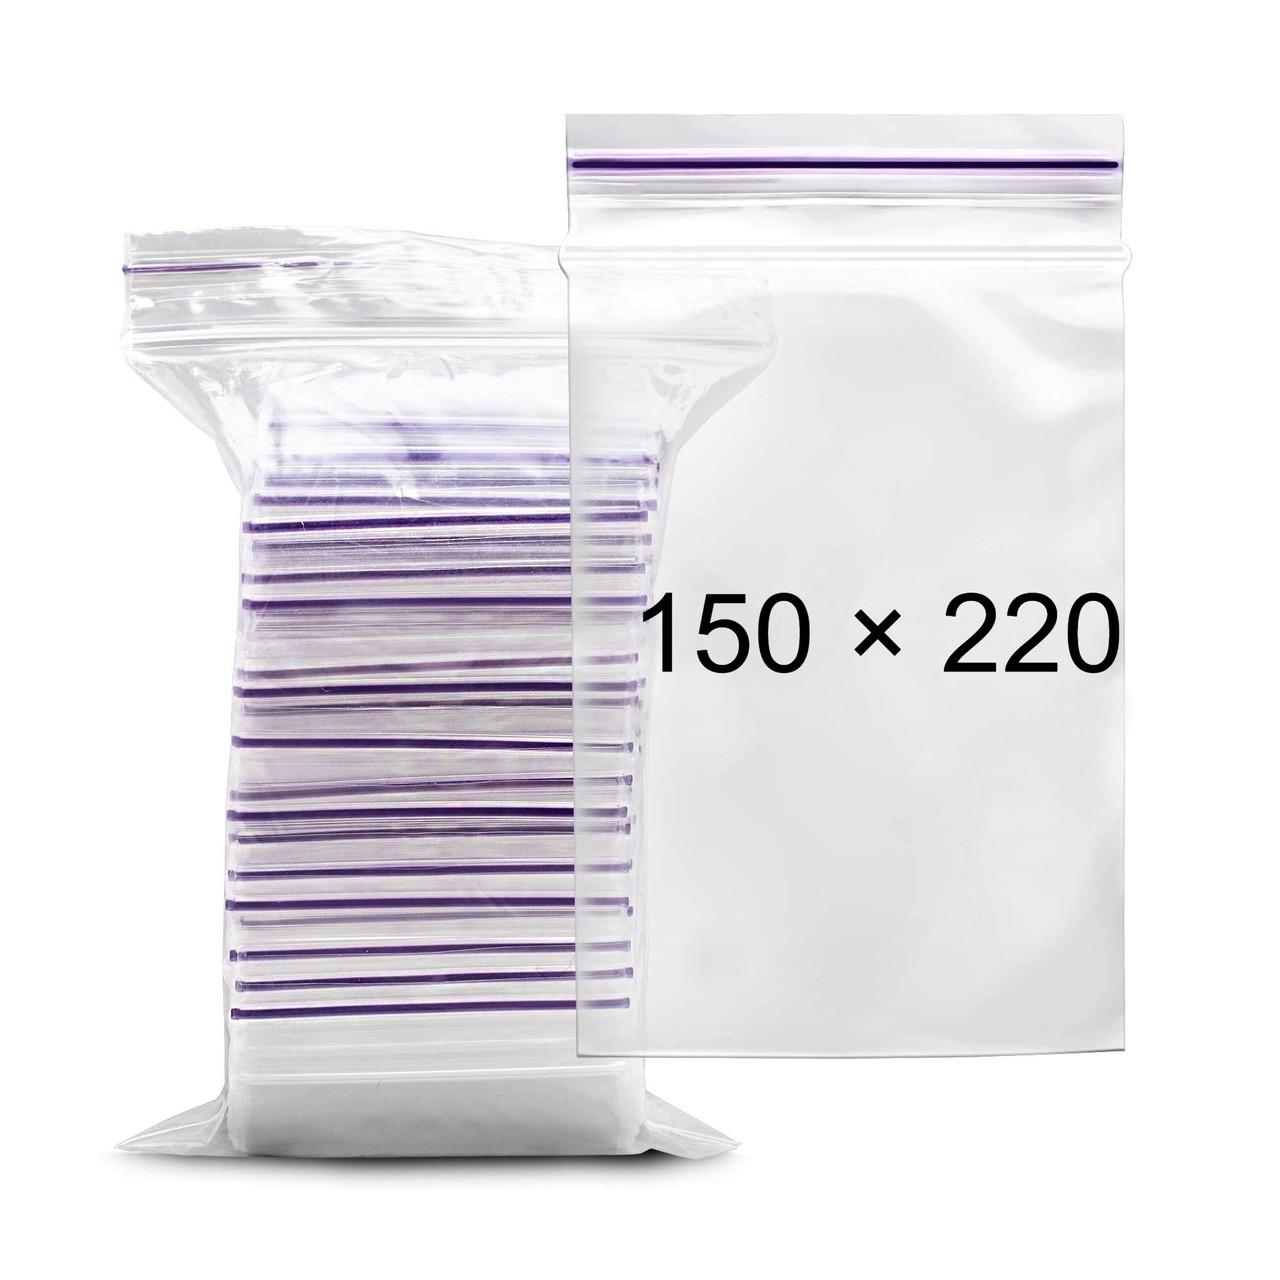 Пакеты с замком Zip-Lock - 150 × 220